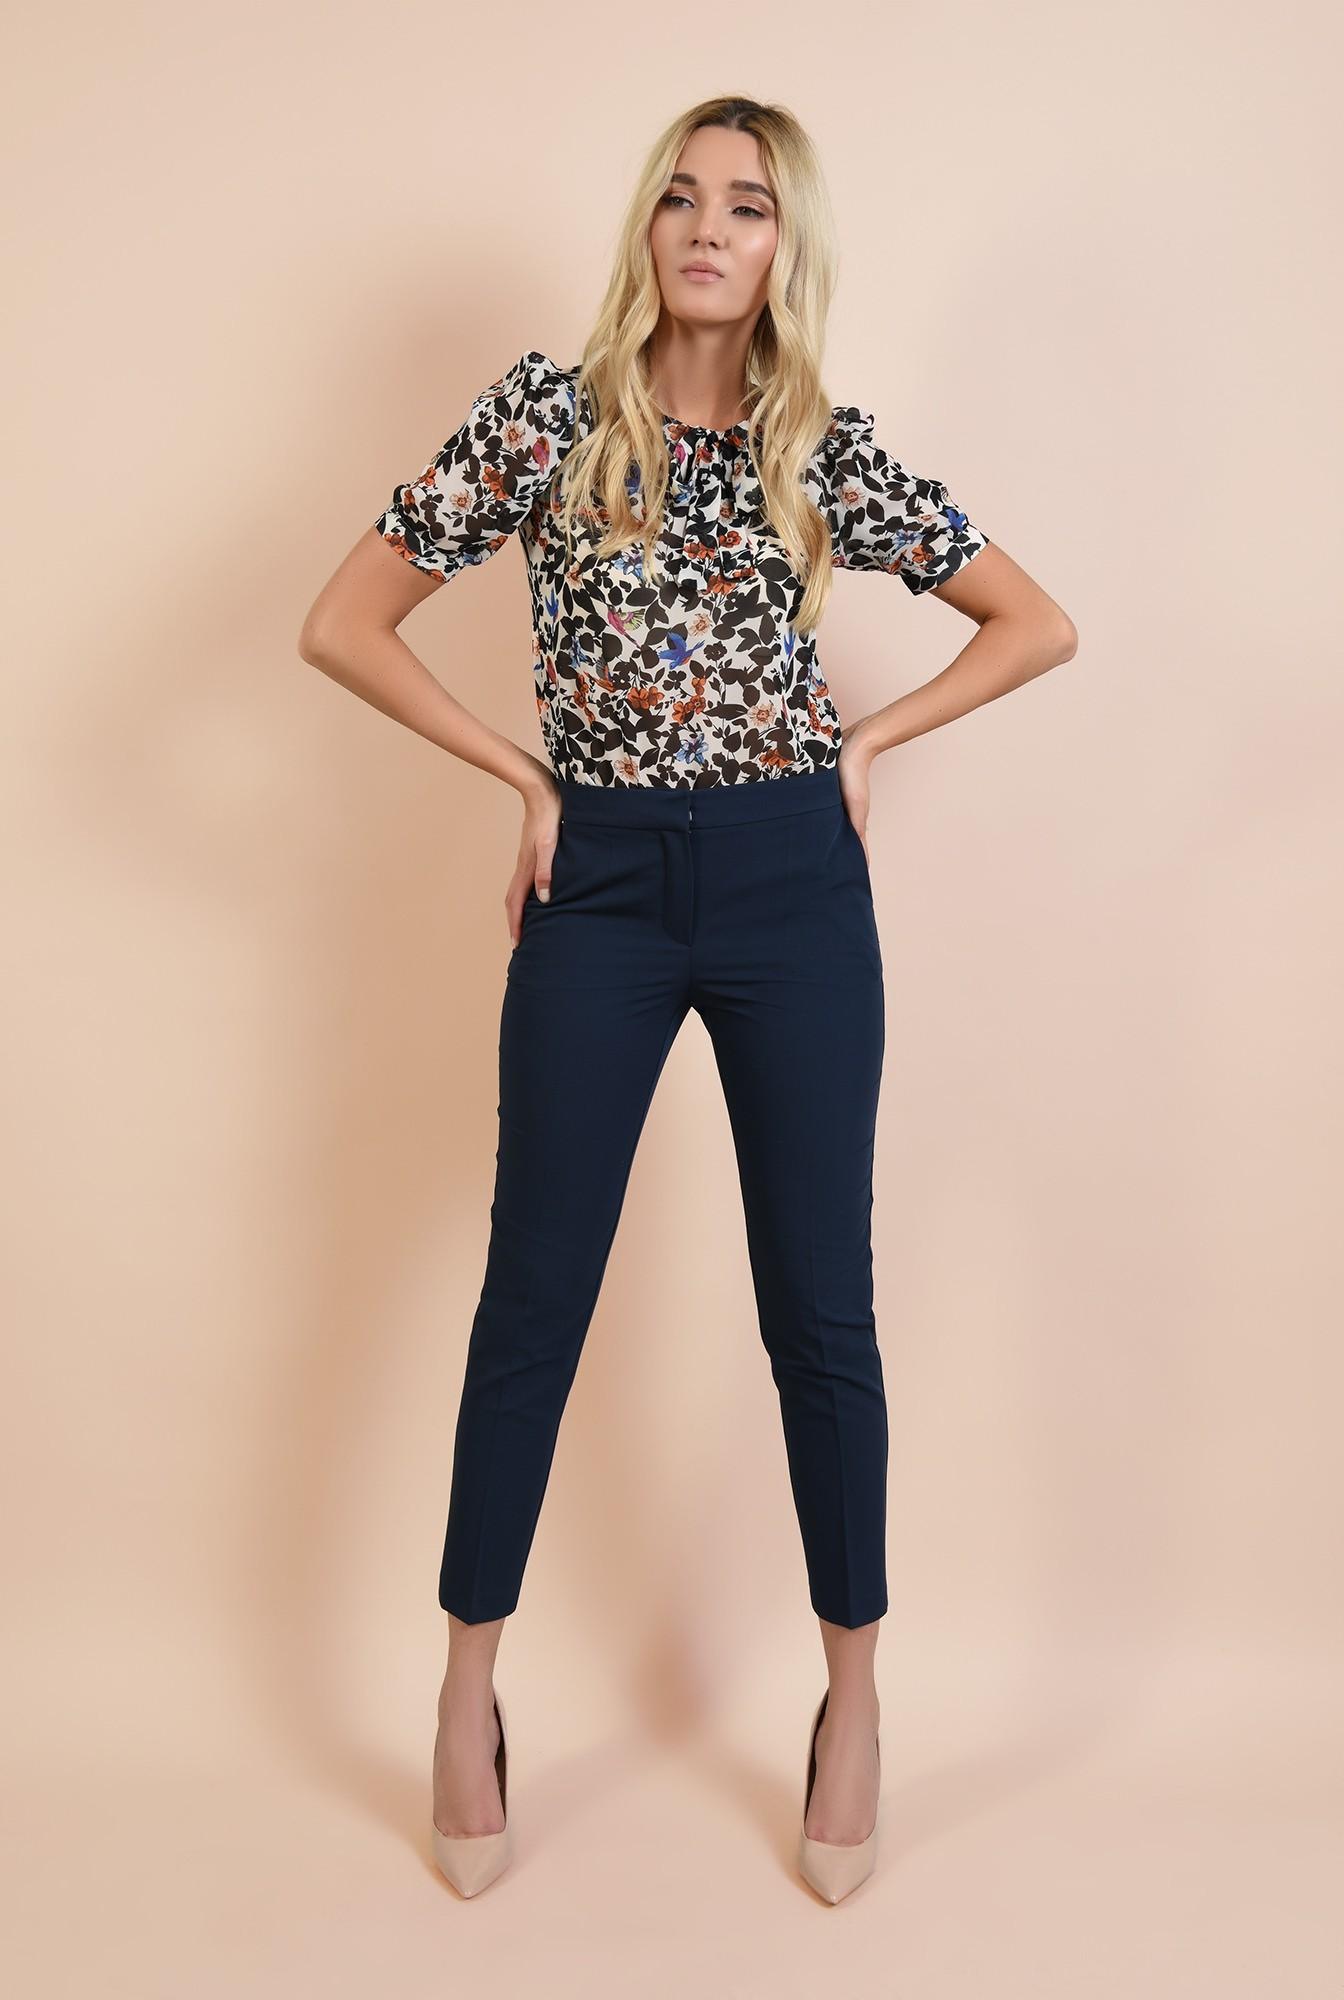 3 - 360 - pantaloni bleumarin, tigareta, cu buzunare, croi conic la dunga